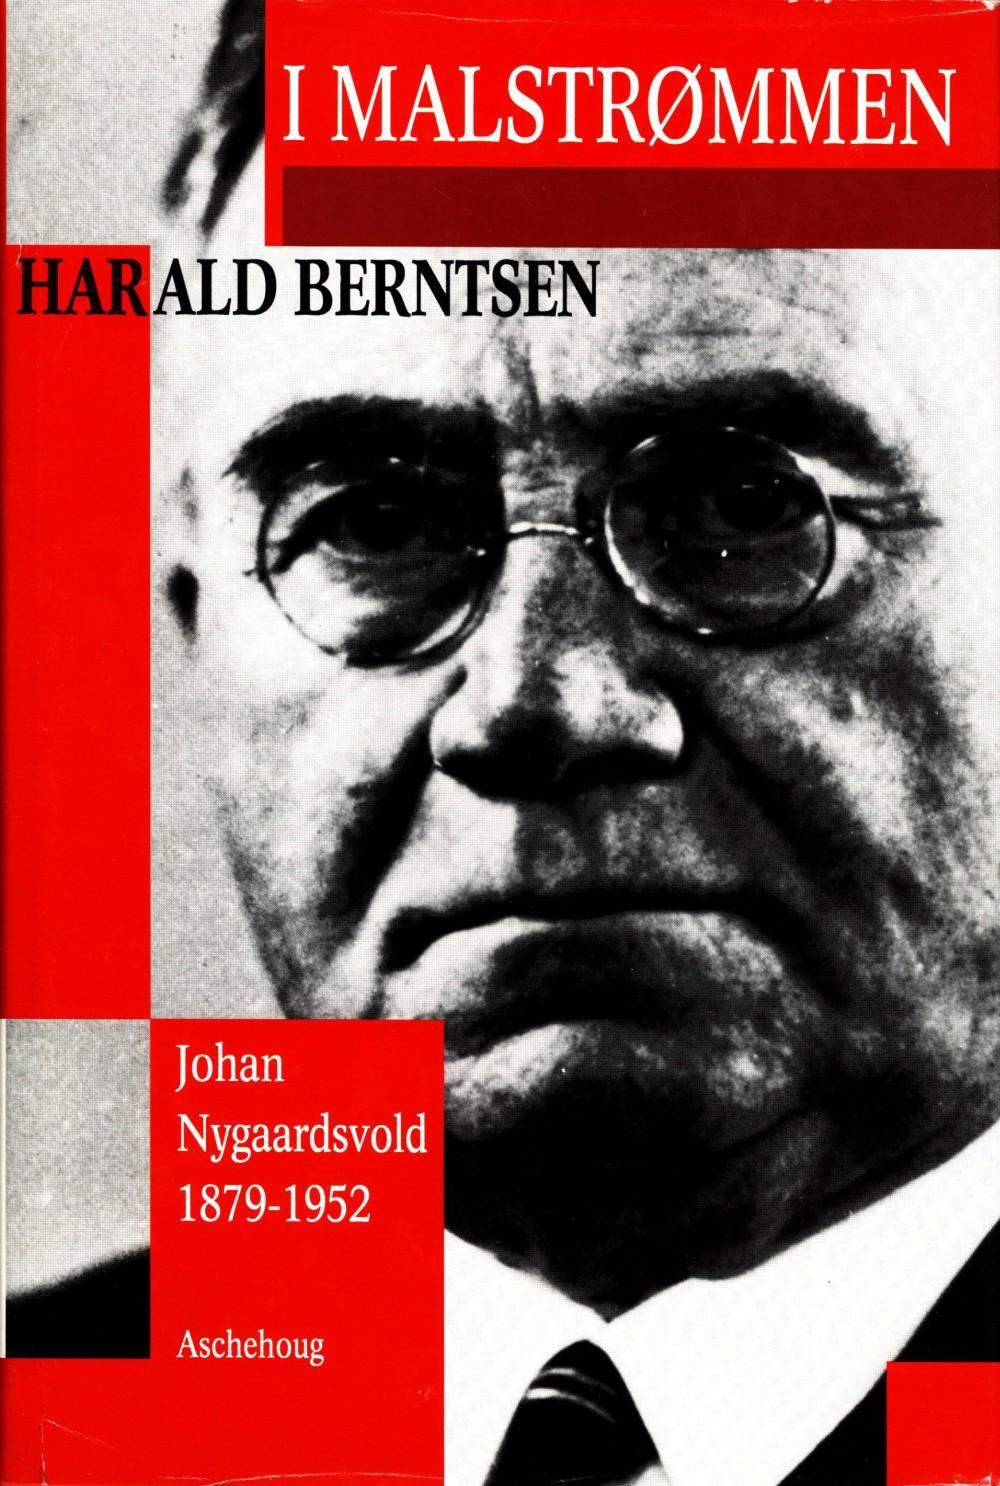 Harald Berntsen: I malstrømmen - Johan Nygaardsvold 1879-1952